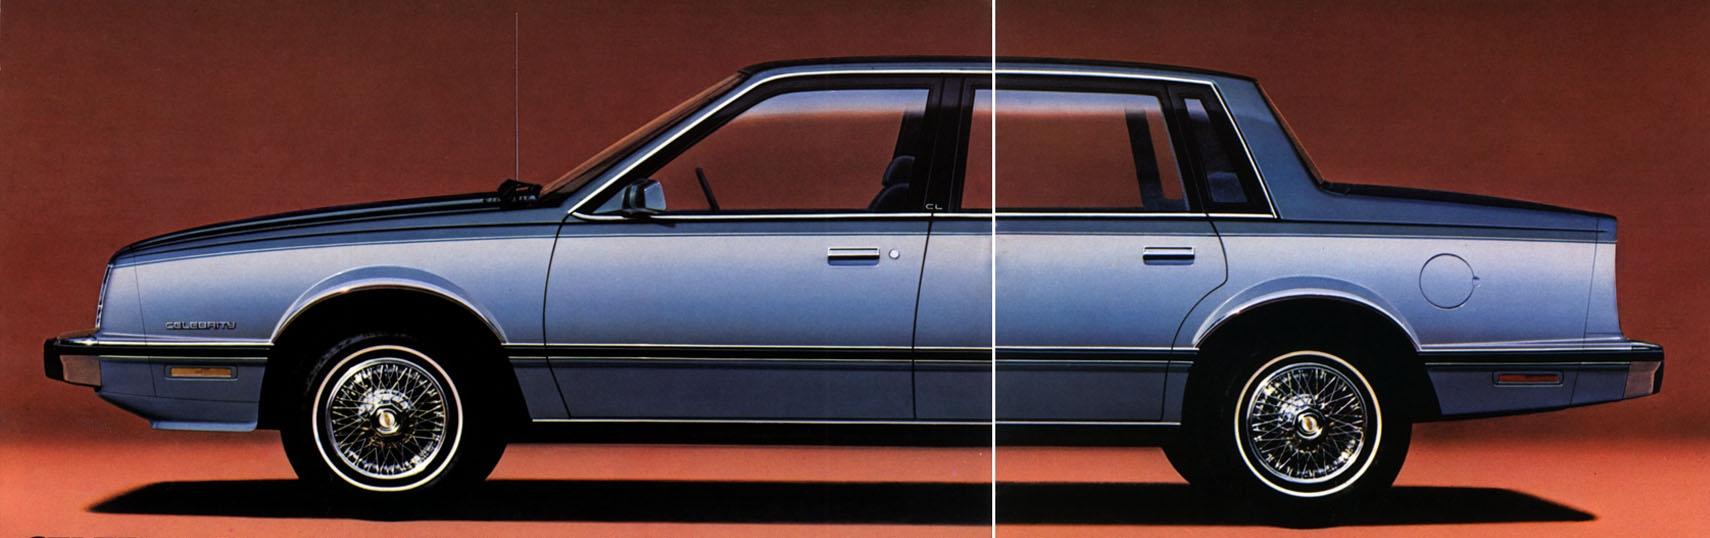 1988 chevy celebrity engine